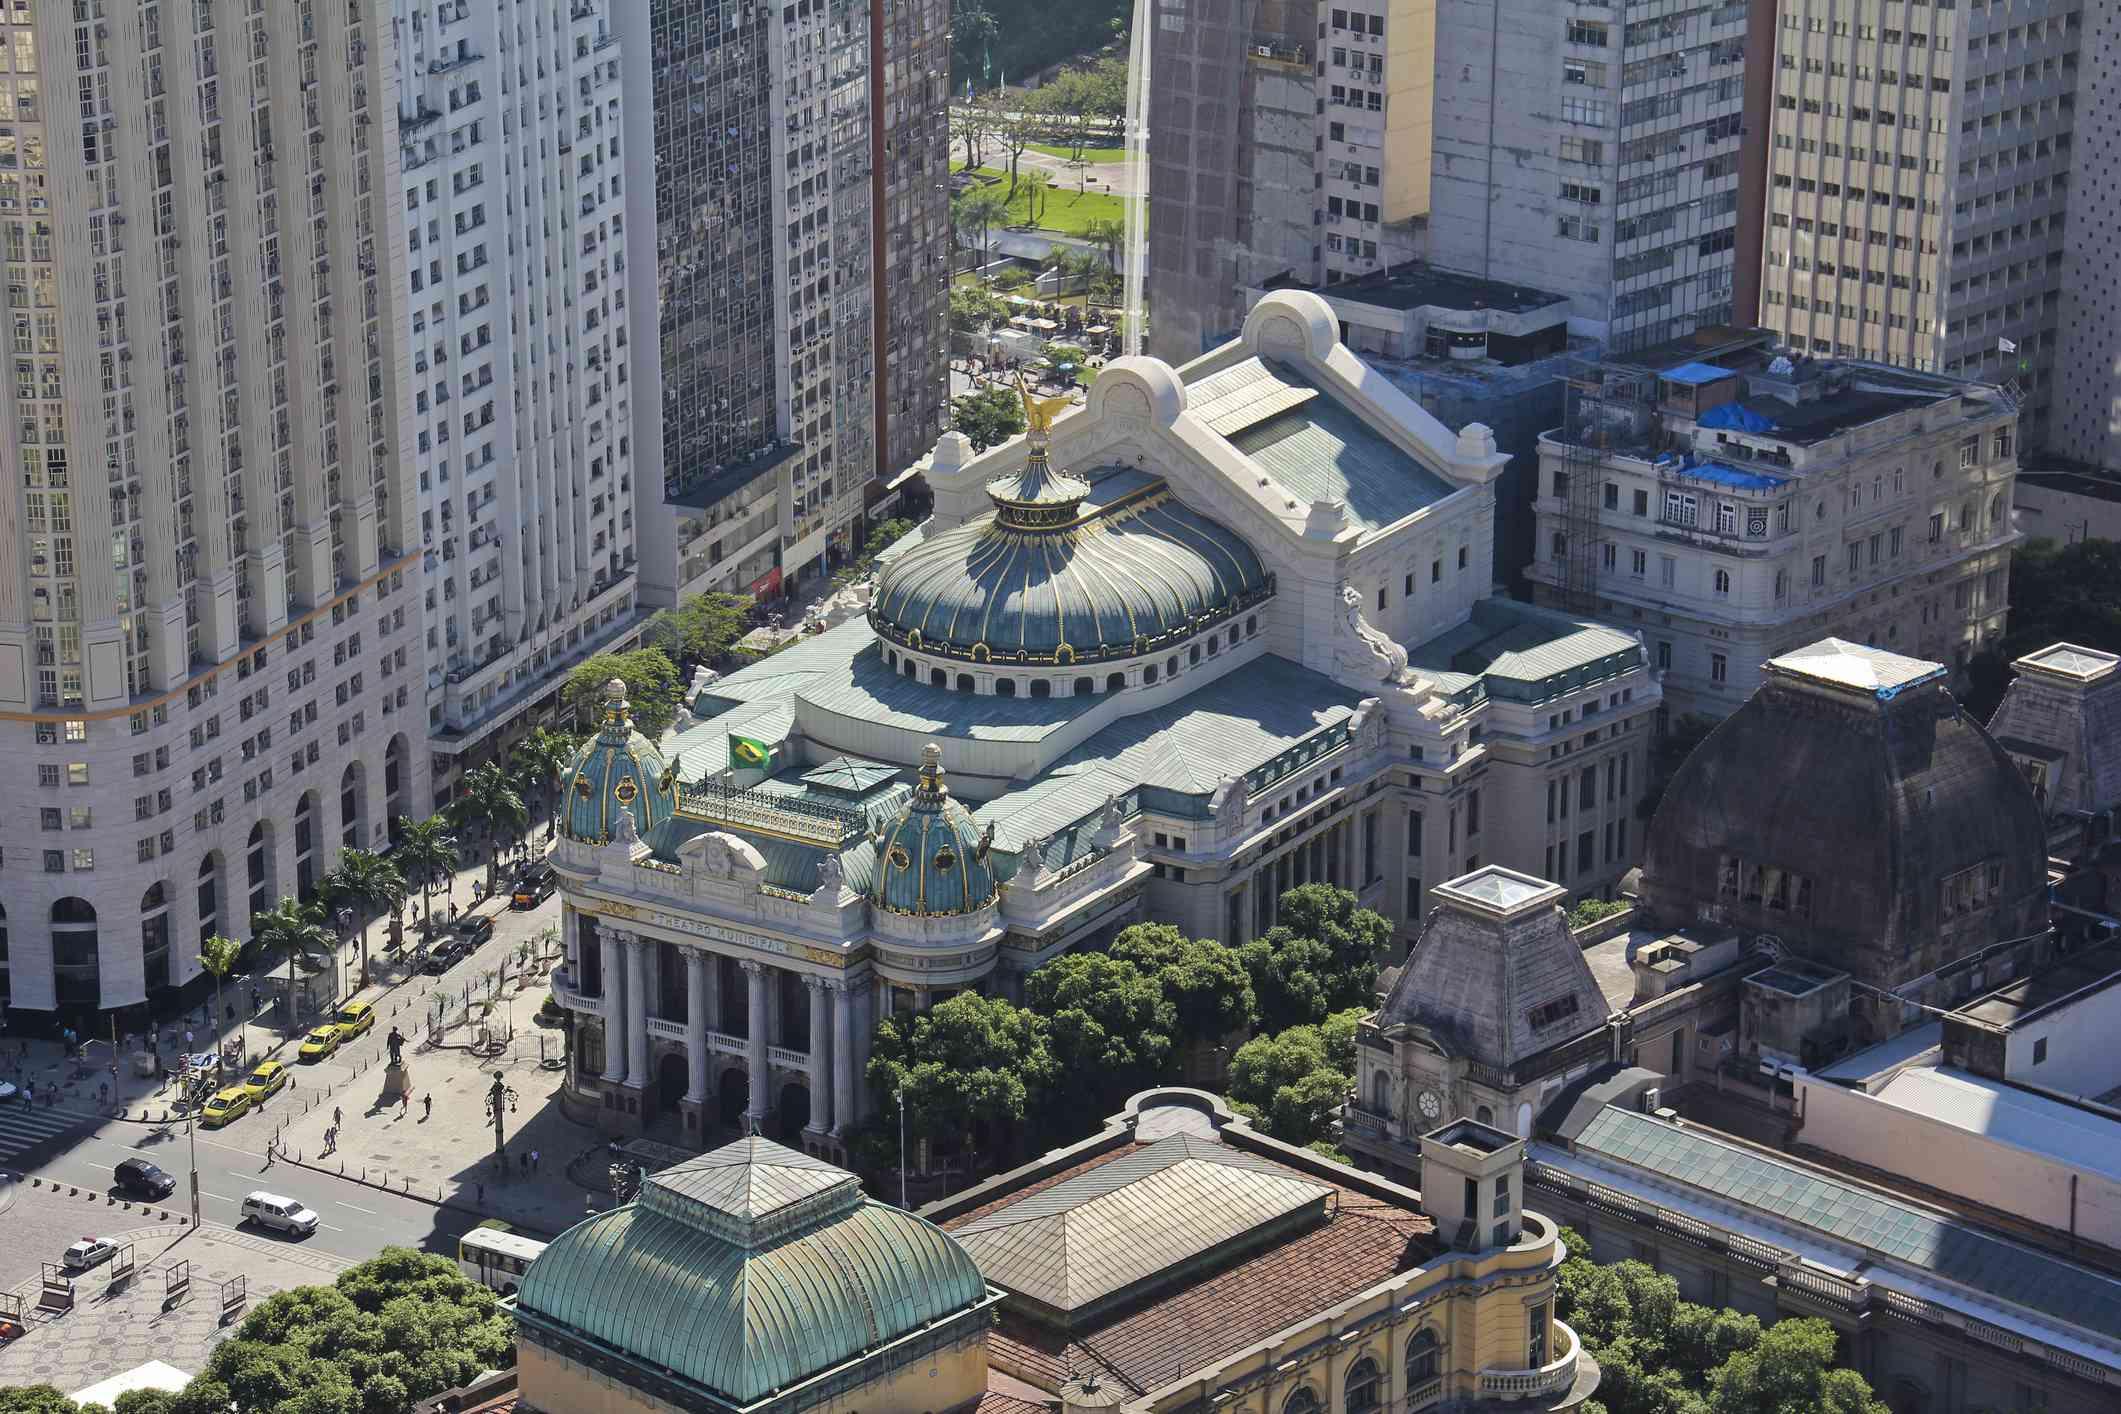 Municipal Theater of Rio de Janeiro